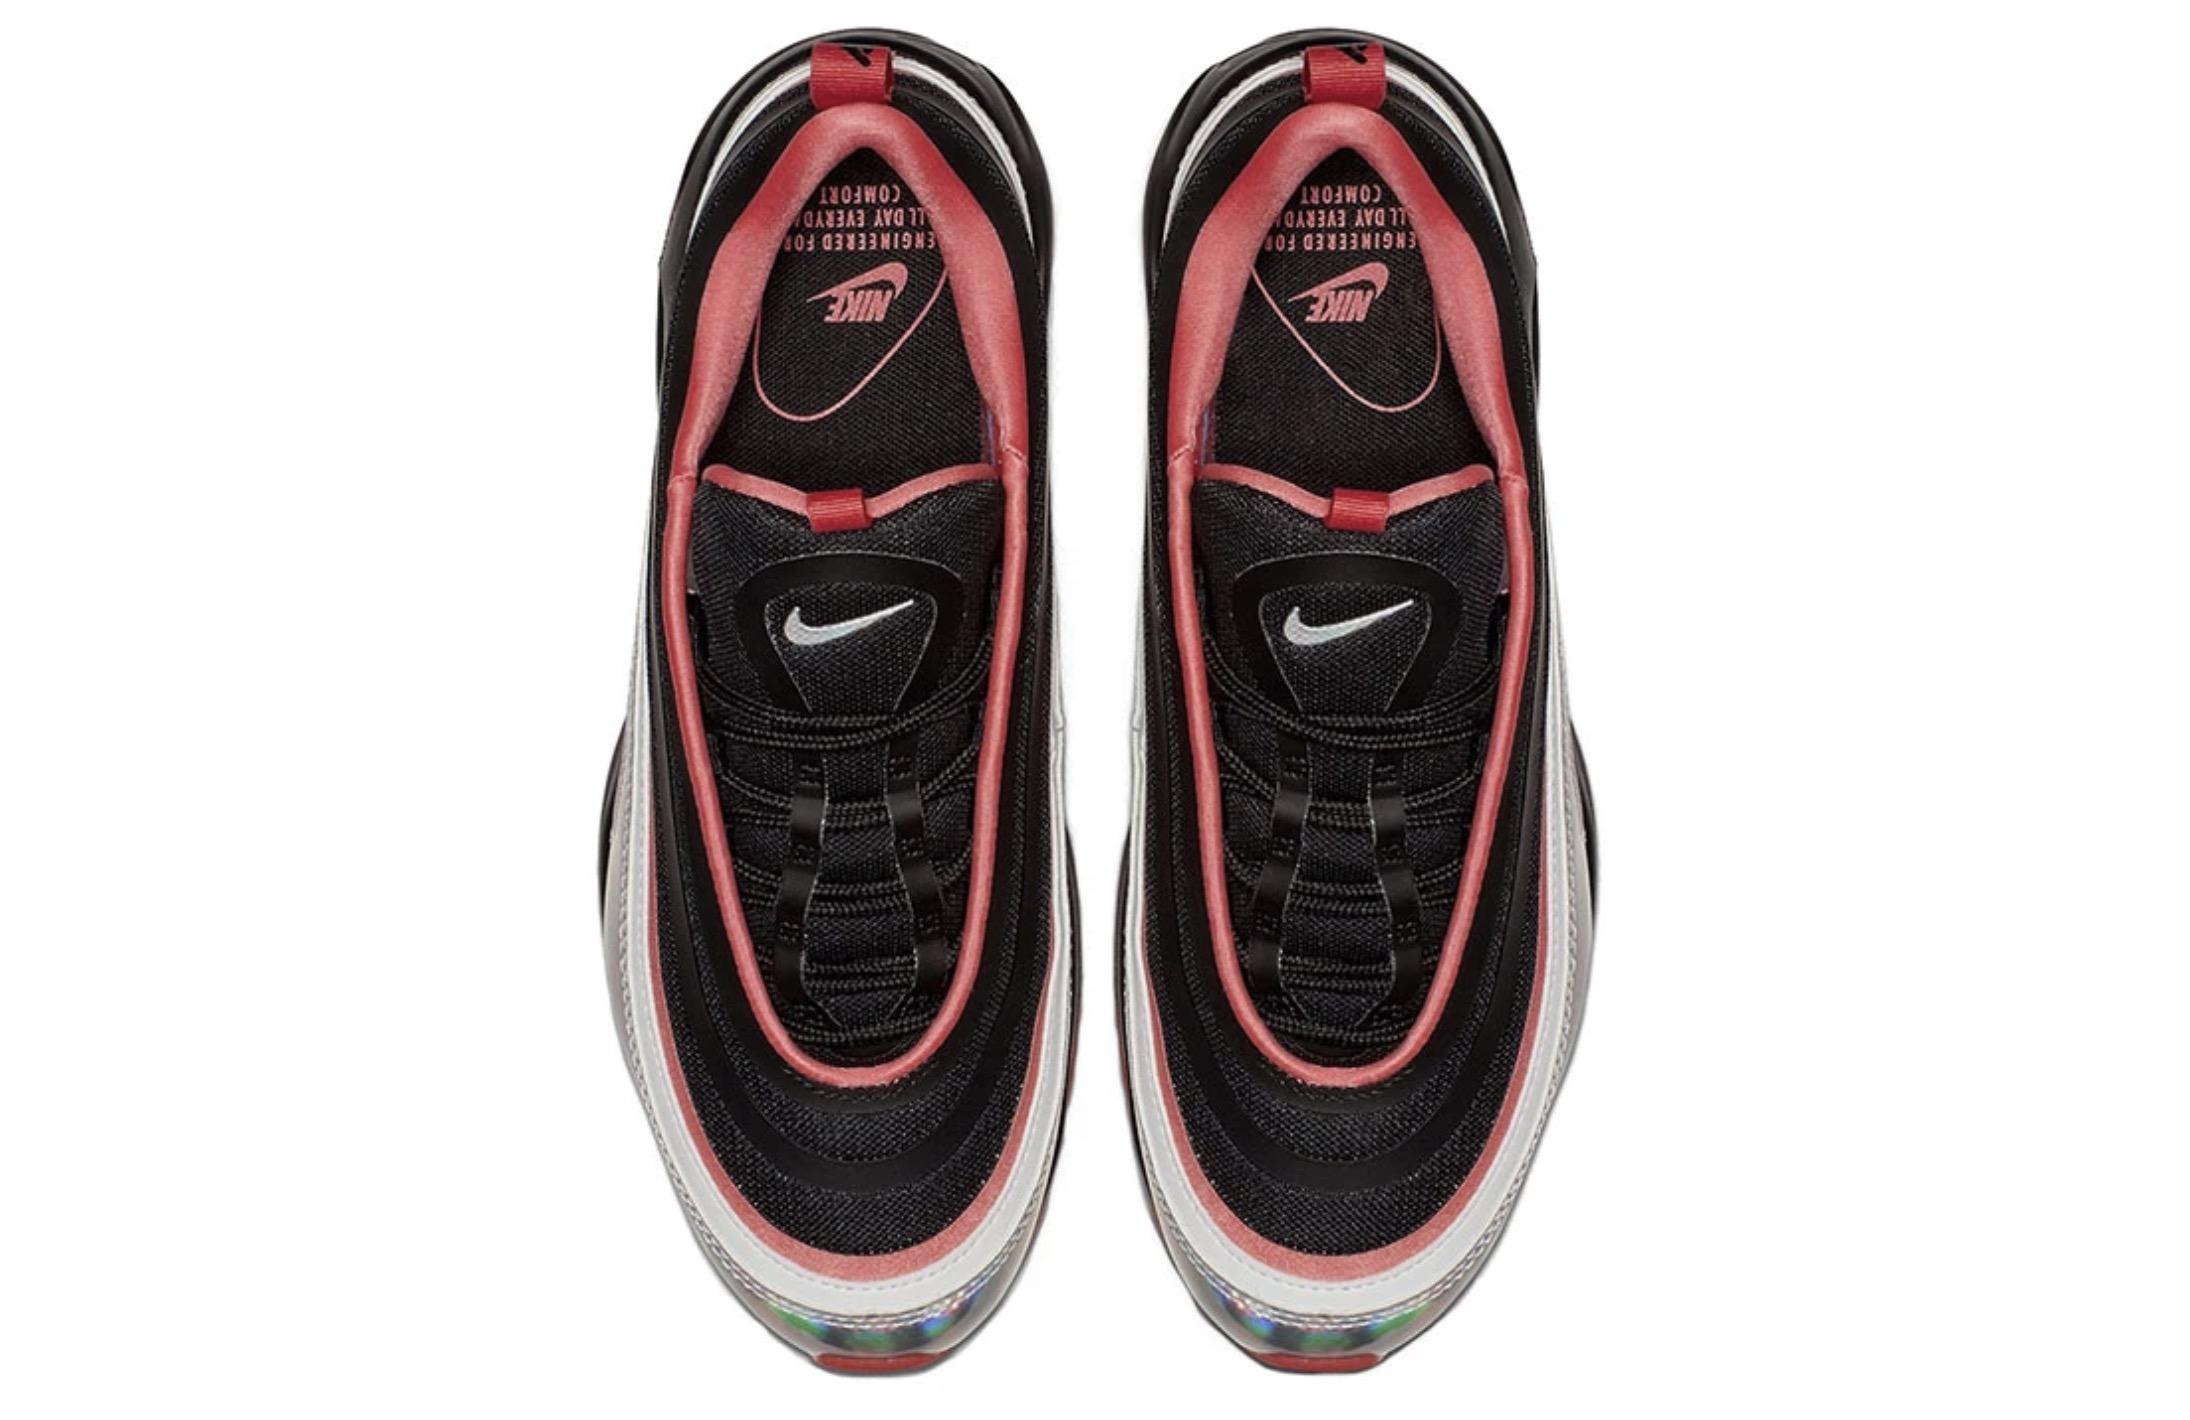 2e514baaa9 Nike's Air Max 97 Ultra Shows Off Iridescent Detailing | Upcoming ...